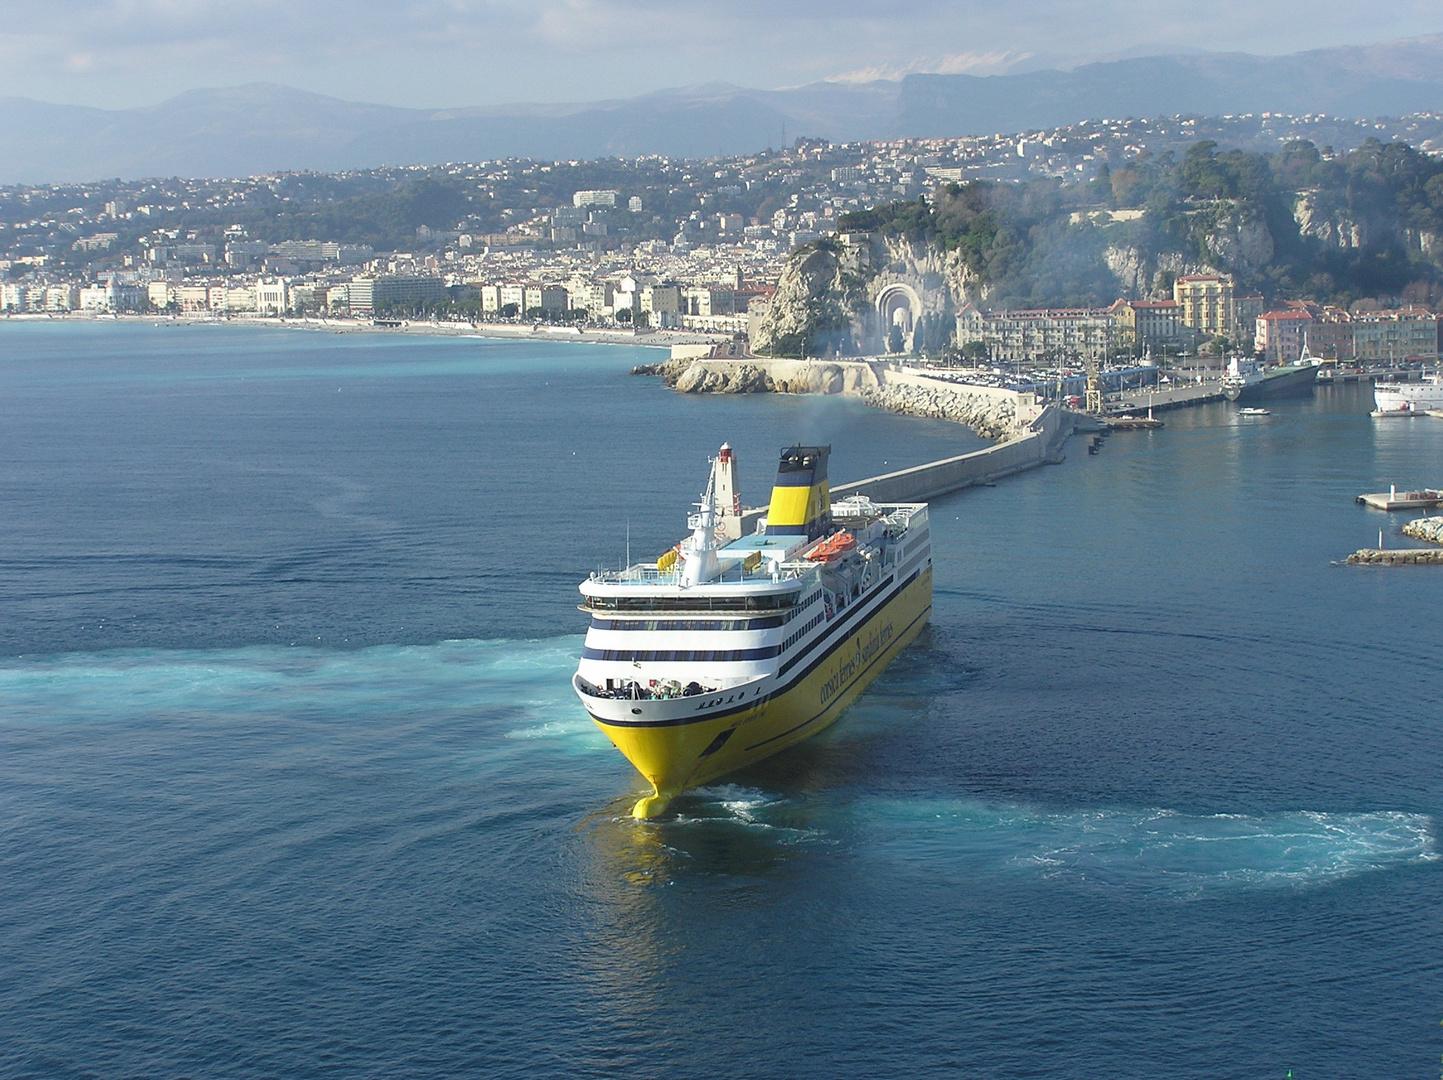 Arrivée à Nice du ferry corsica-sardinia